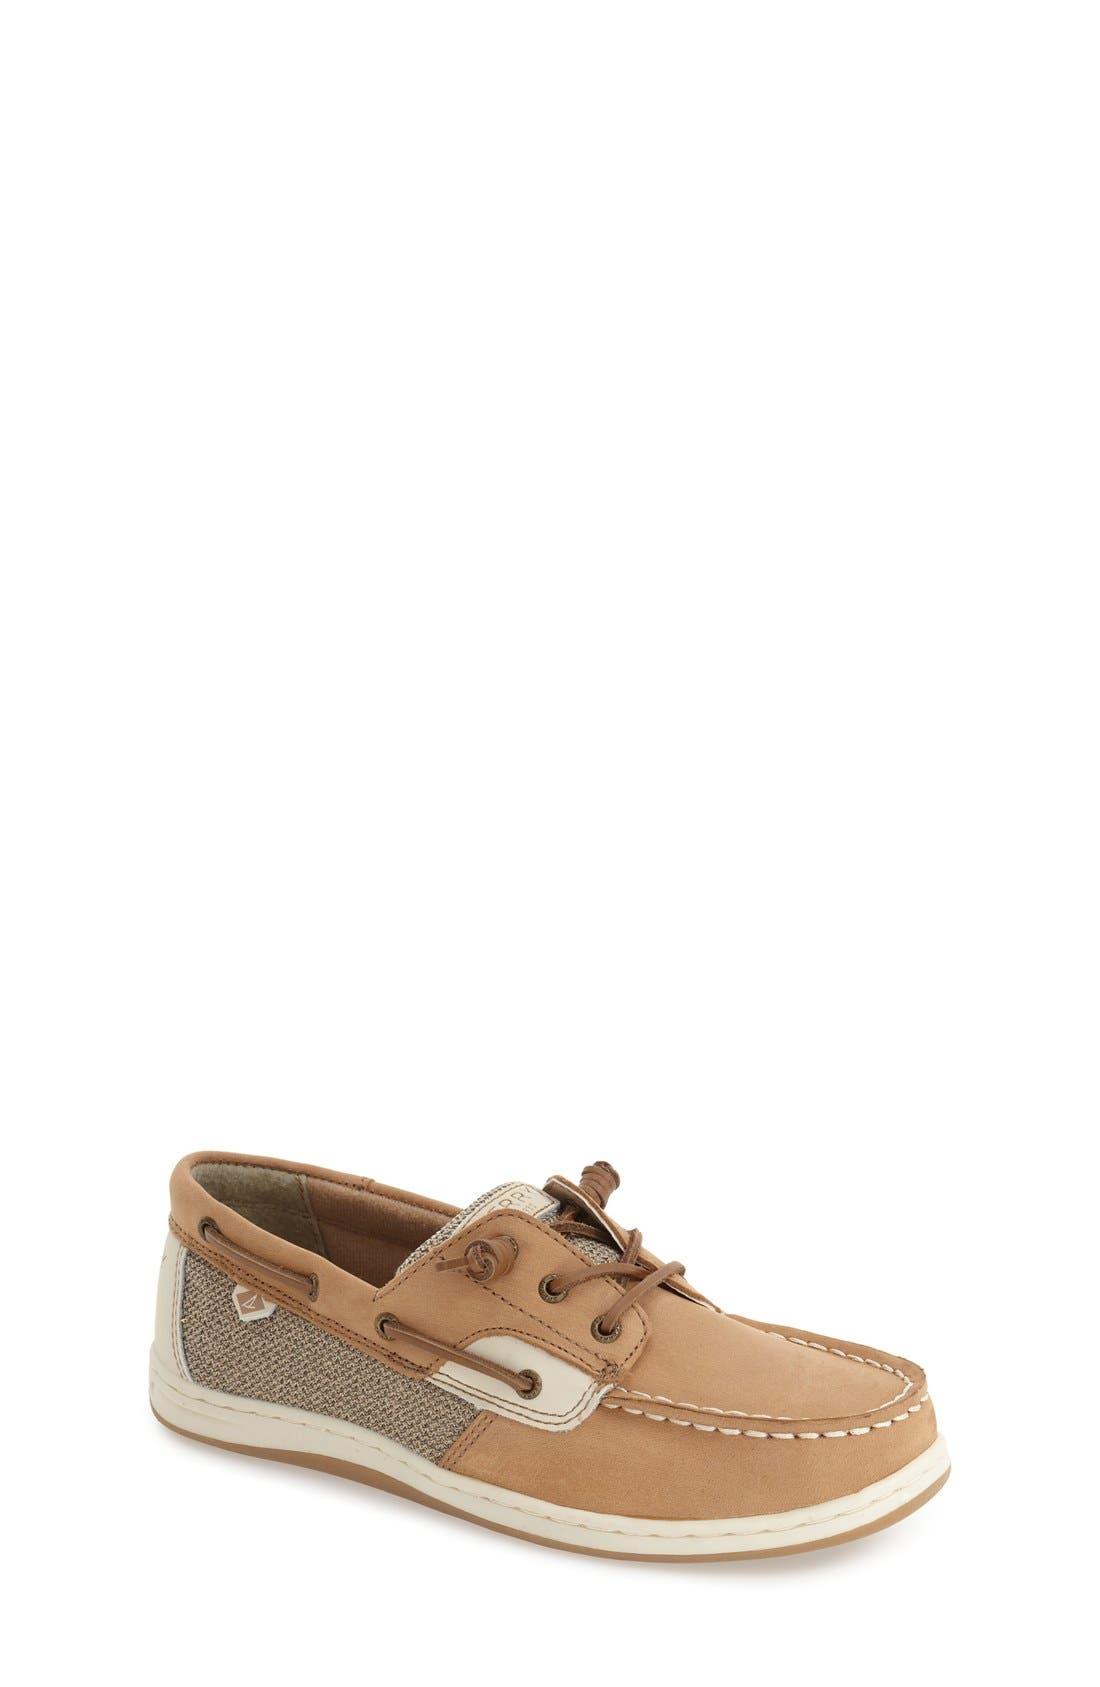 'Songfish' Boat Shoe,                             Main thumbnail 1, color,                             Linen/ Oat Leather